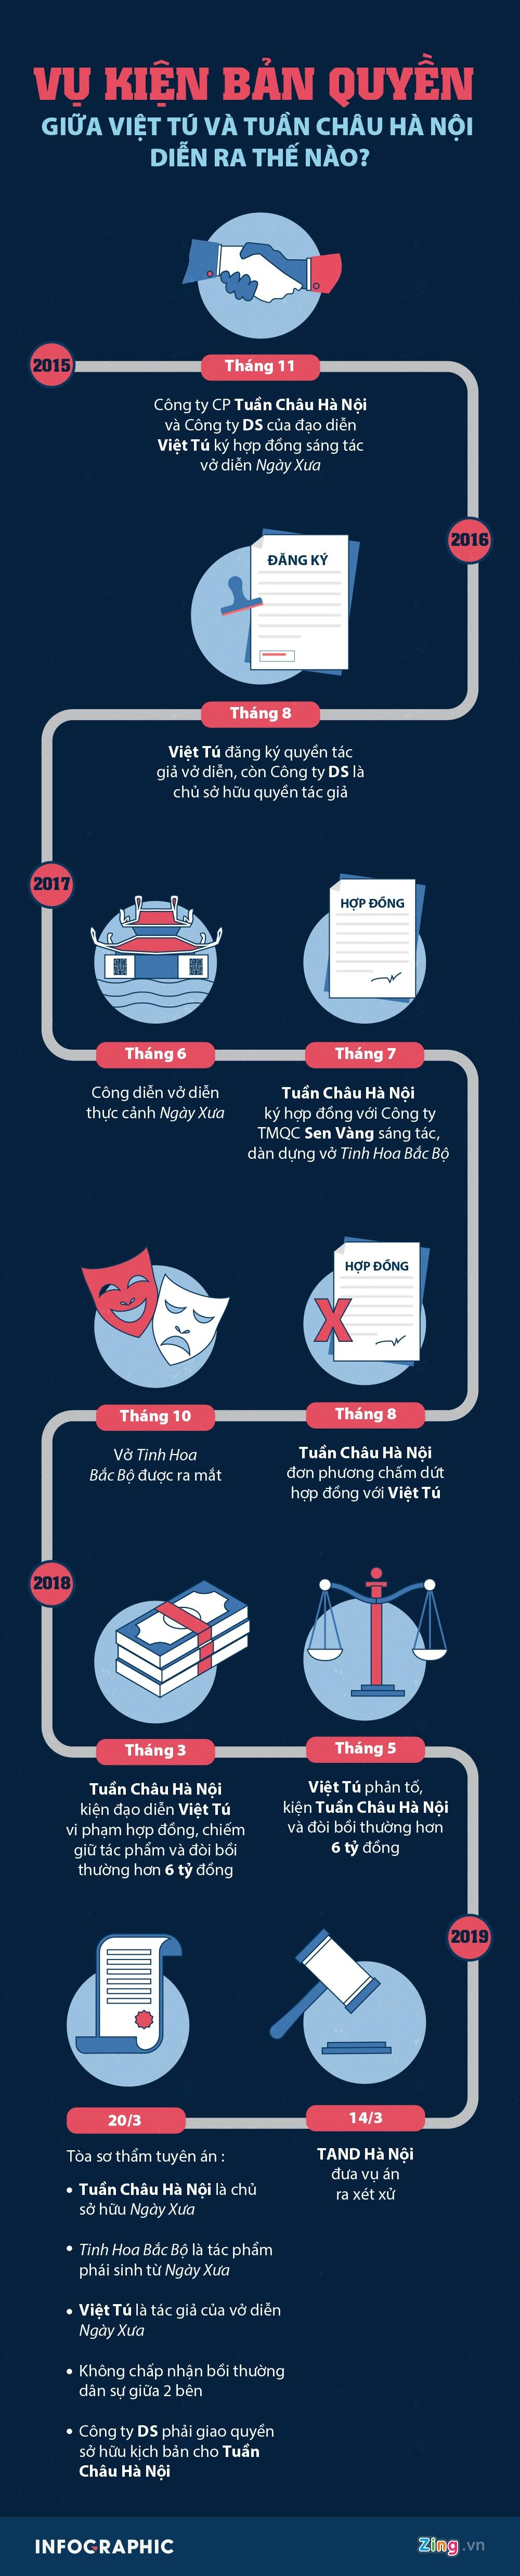 Viet Tu kien Tuan Chau Ha Noi anh 1